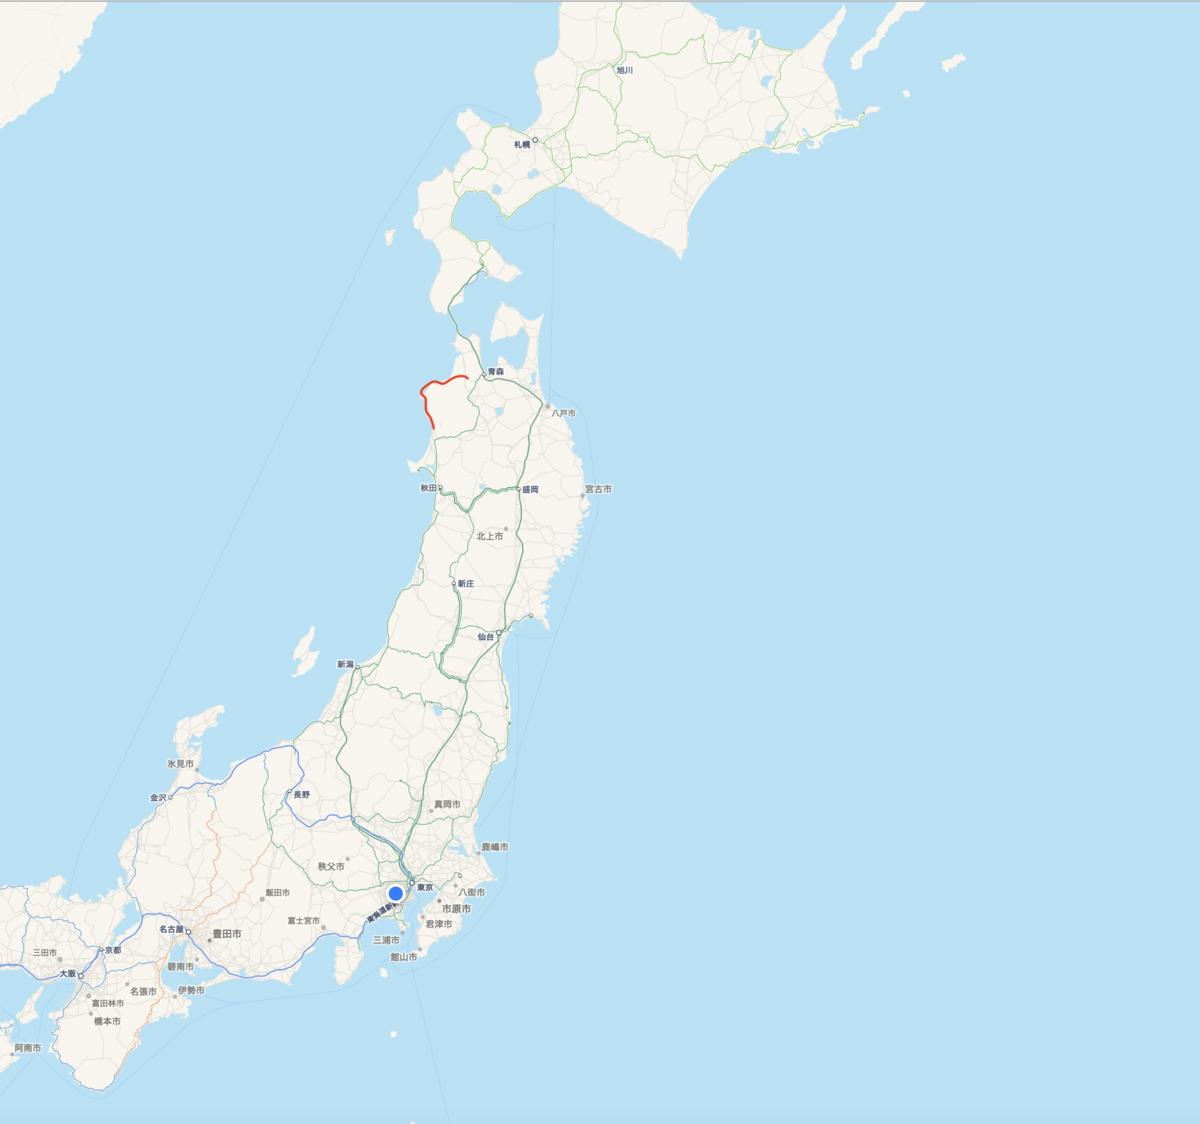 f:id:kootabi:20200204110247p:plain